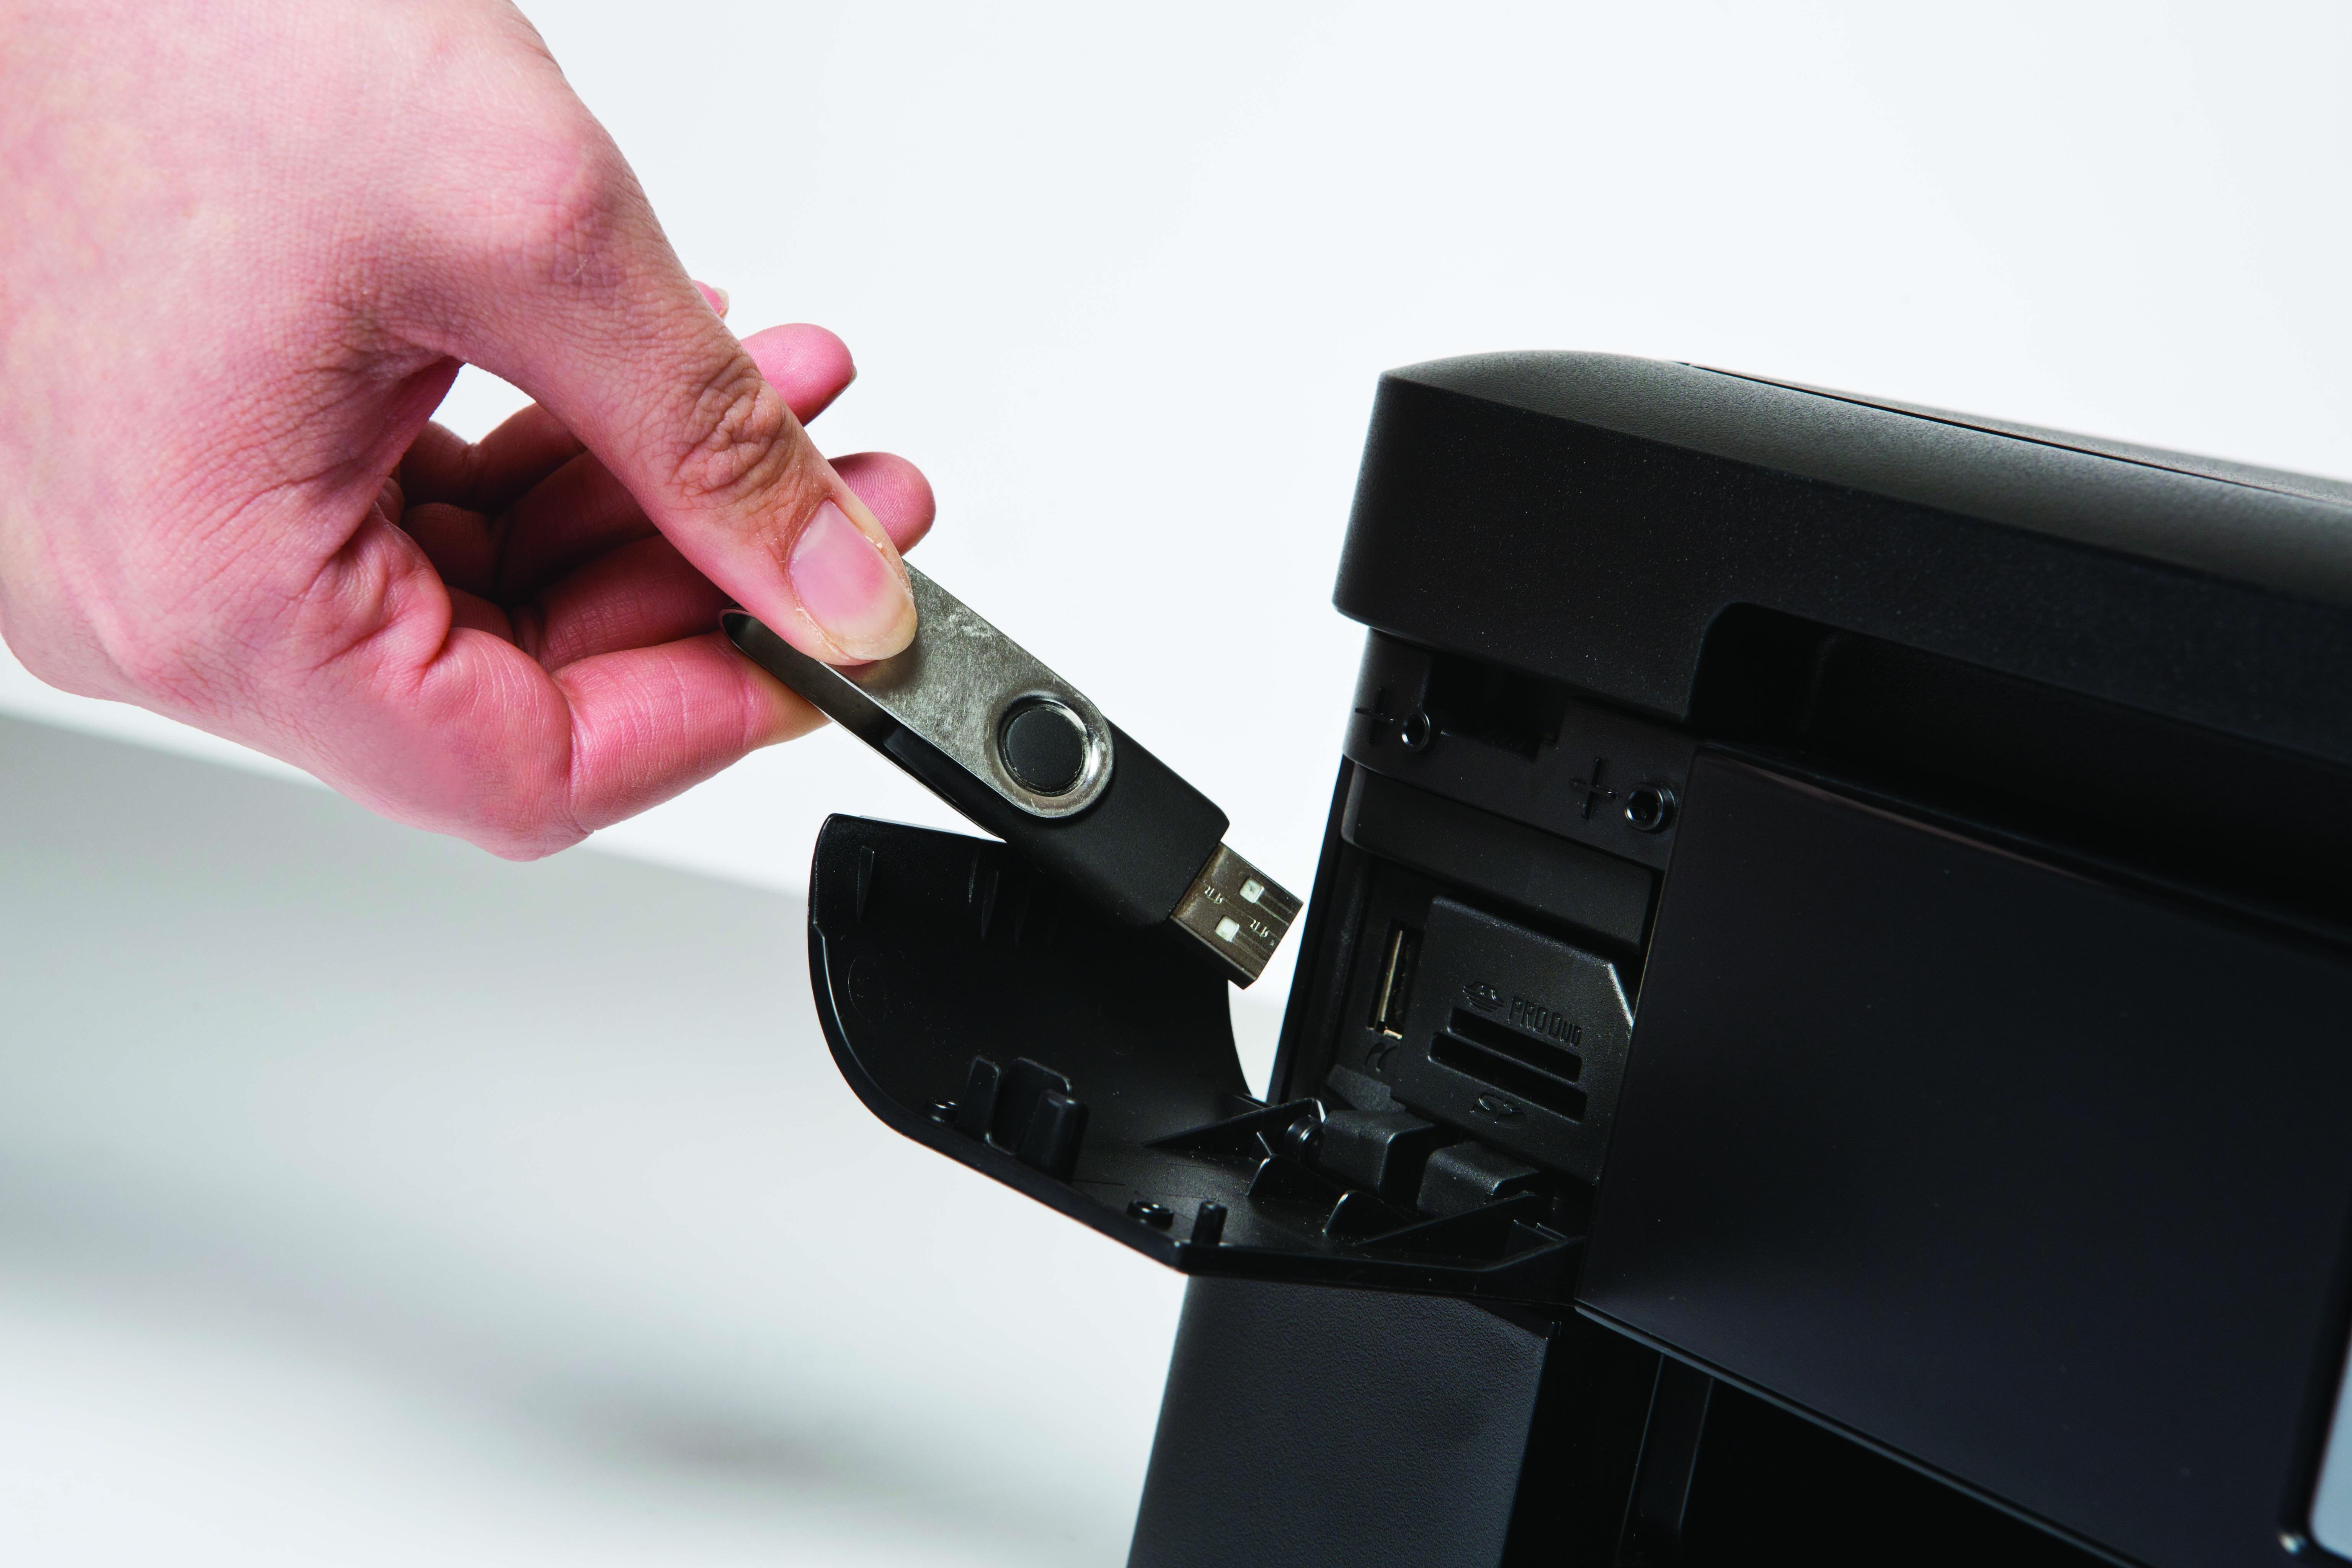 USB_scan_print